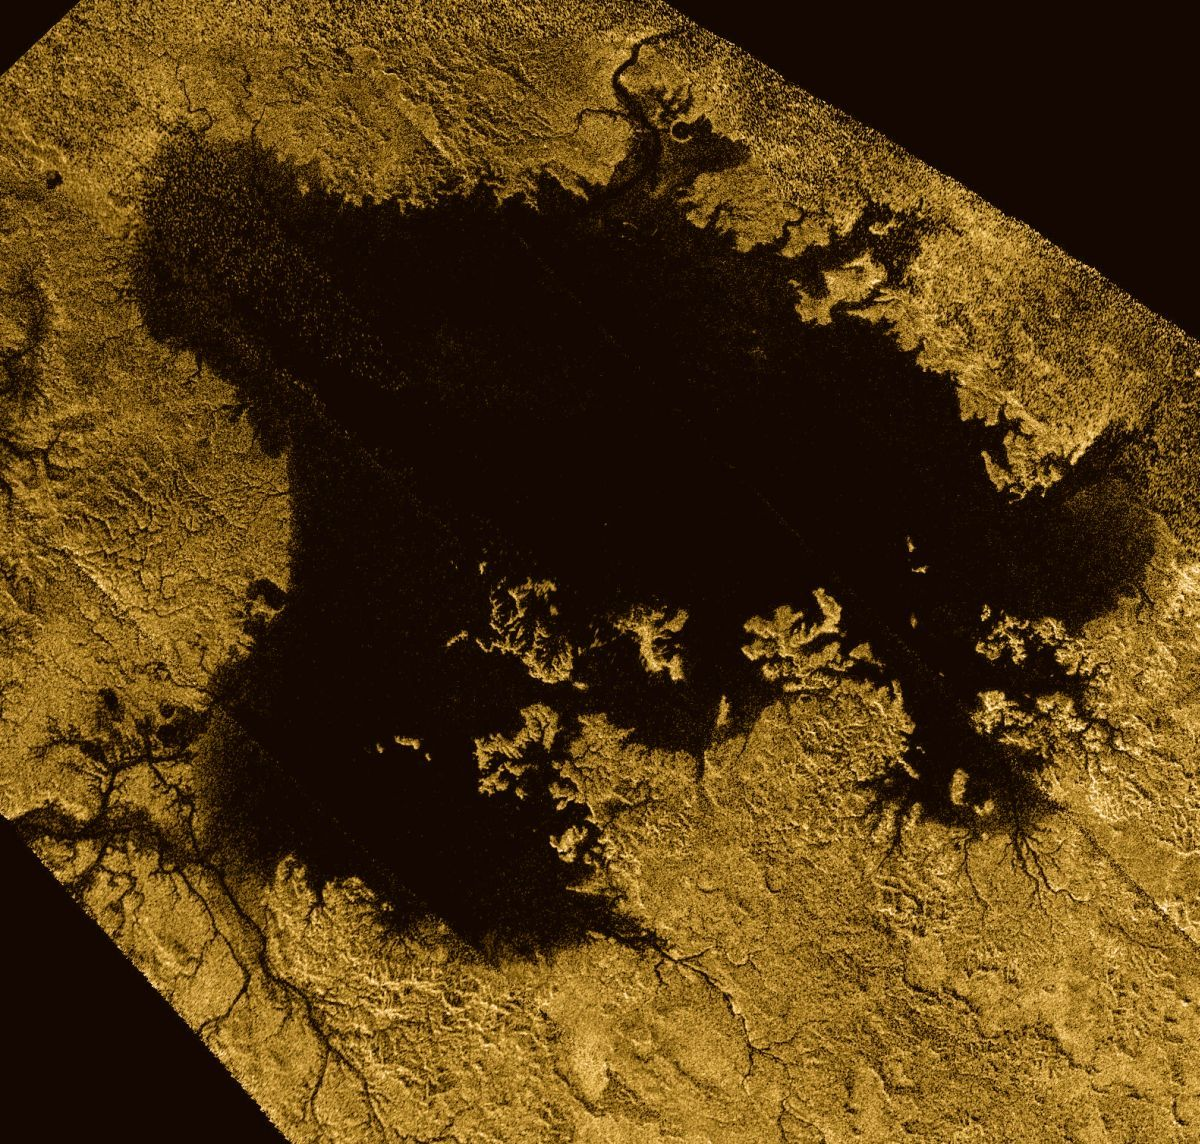 NASA/JPL-Caltech/ASI/Cornell